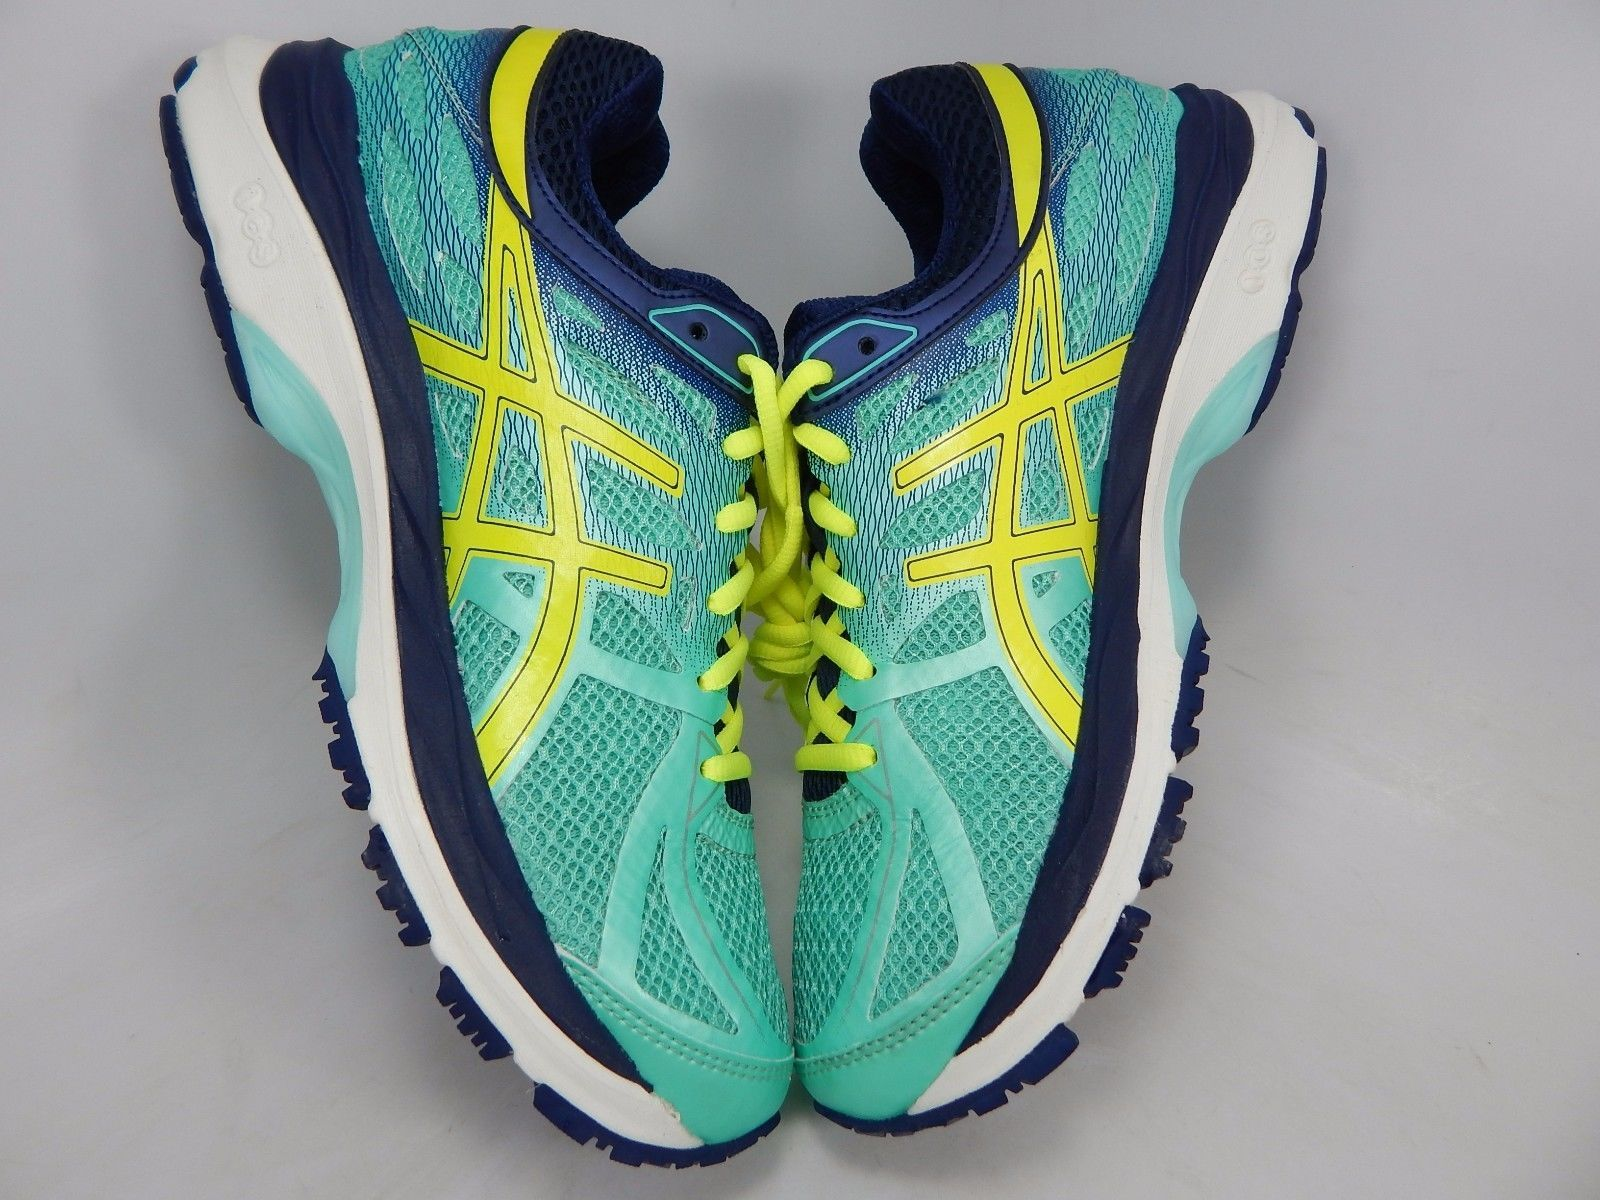 MISMATCH Asics Gel Cumulus 17 Women's Running Shoes Size US 7.5 Left & 7 Right